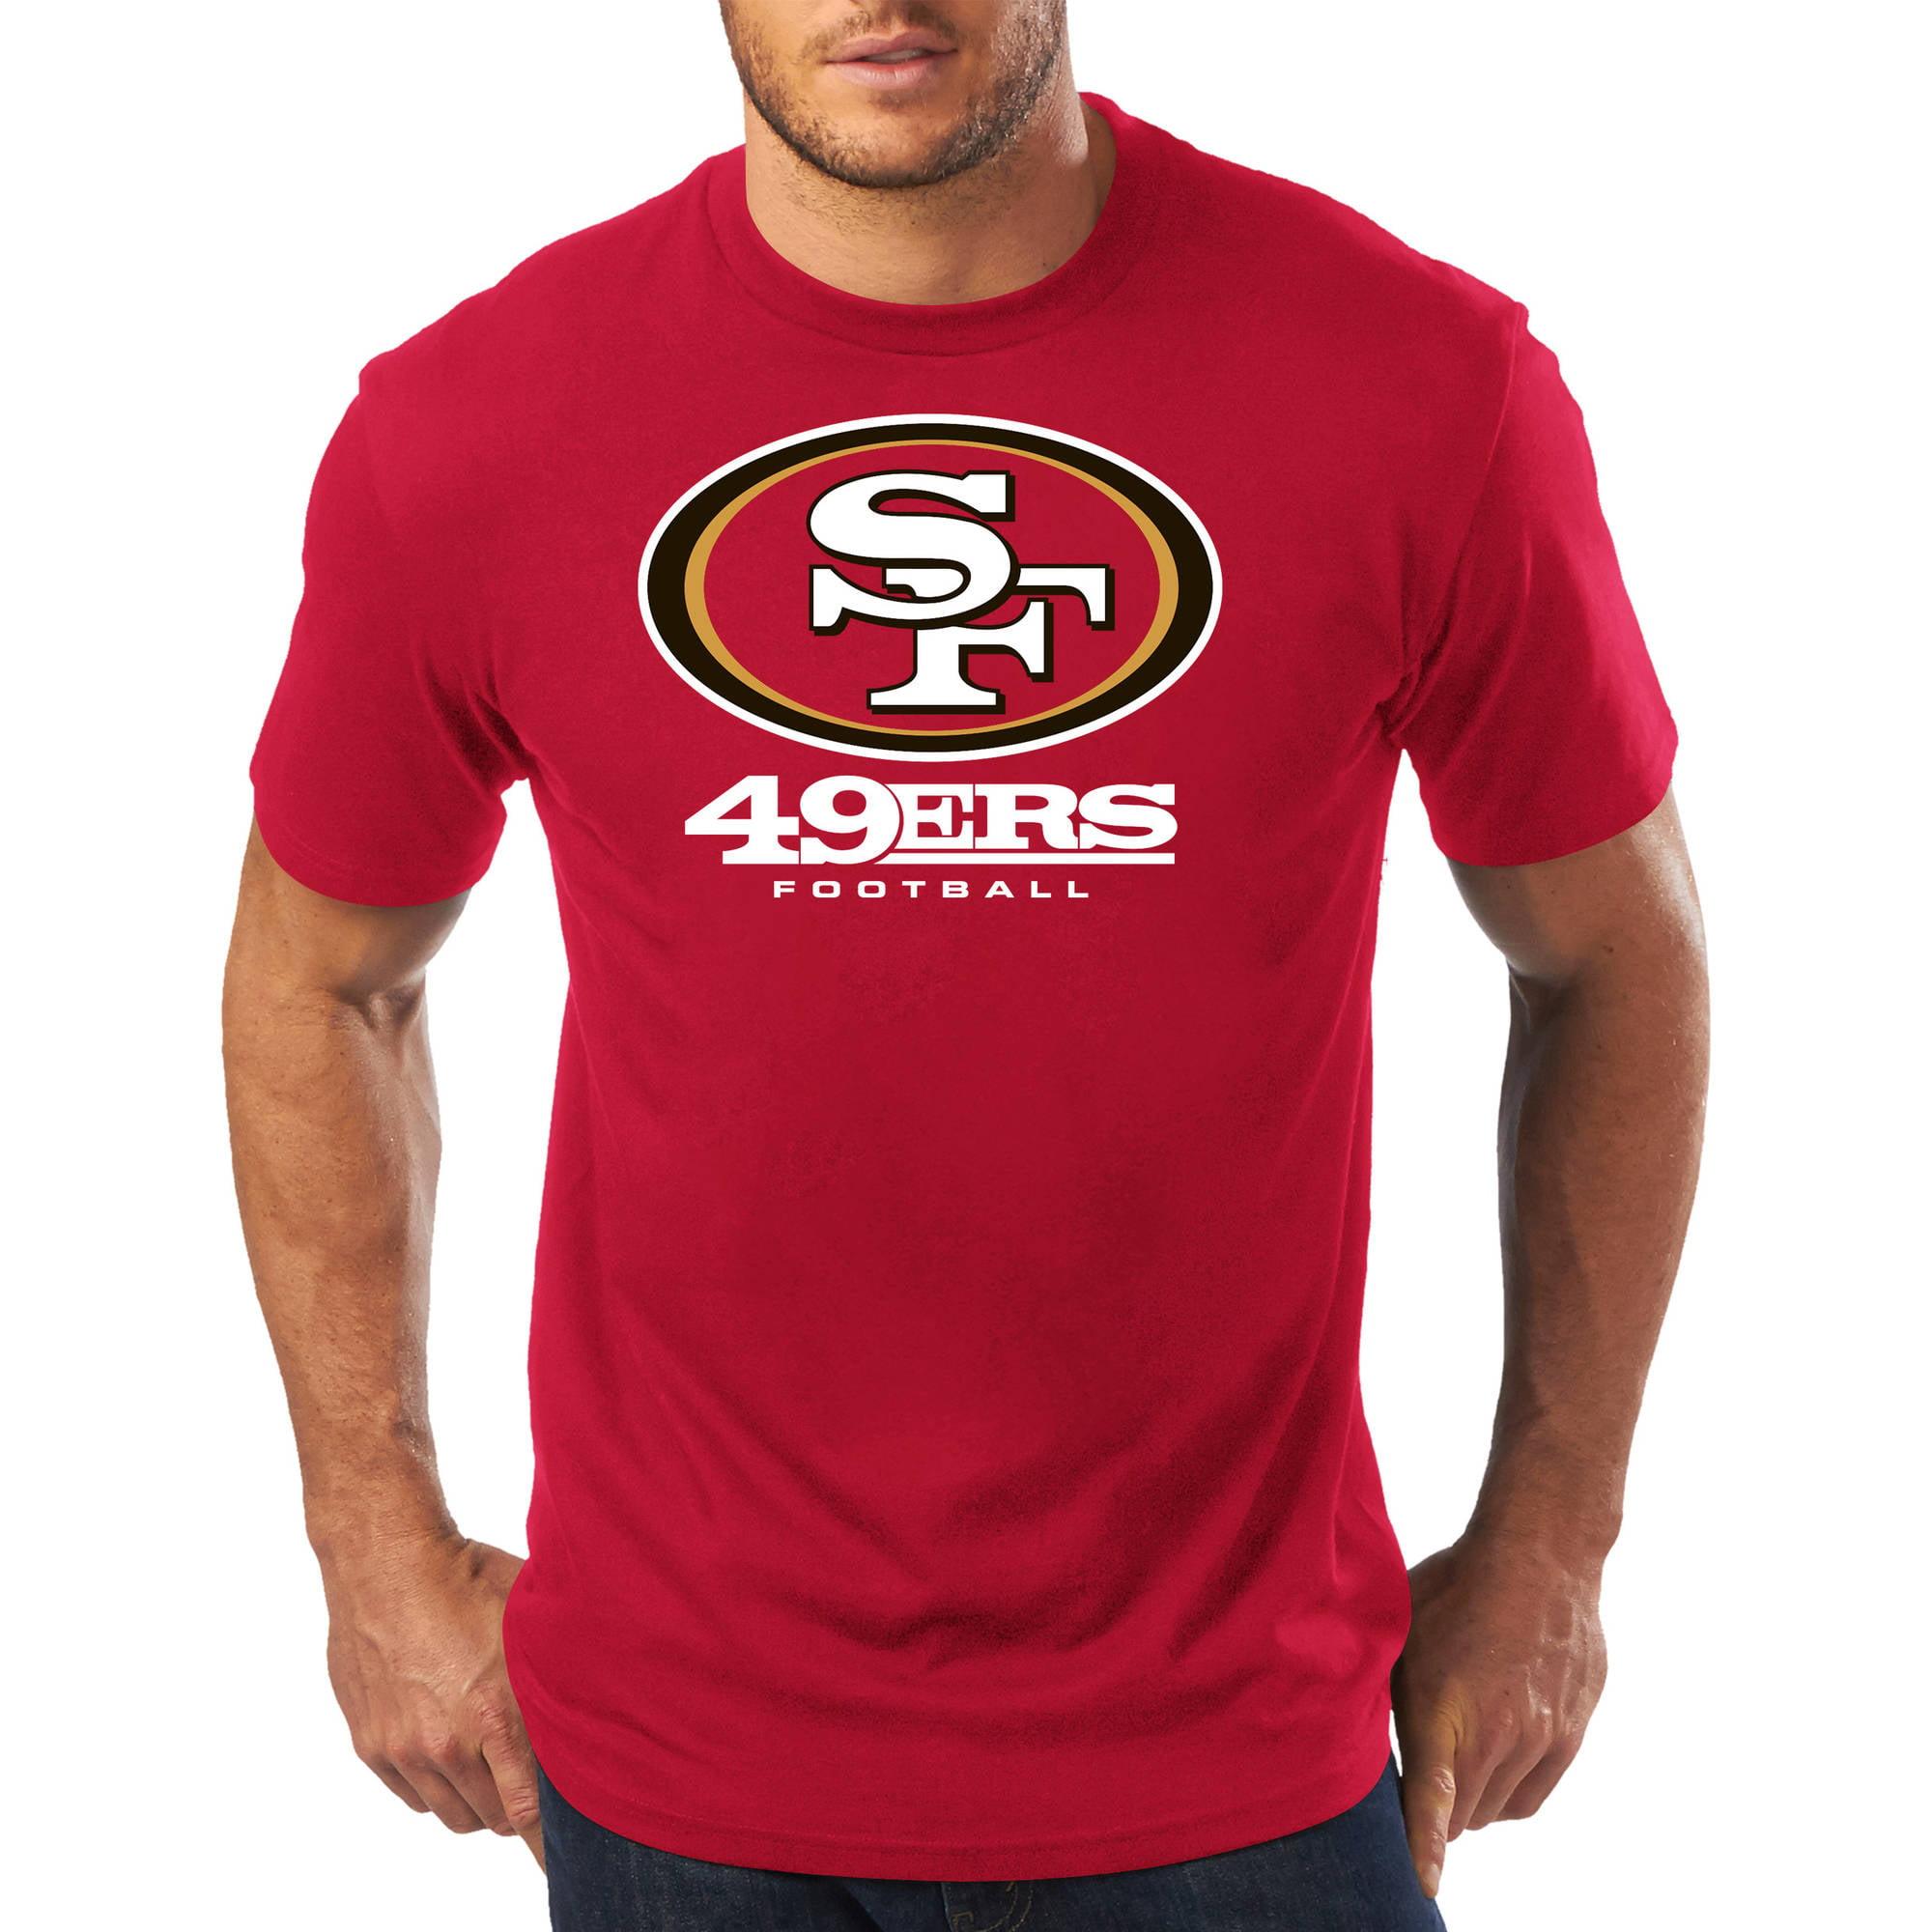 Big Men's NFL San Francisco 49Ers Short Sleeve Tee